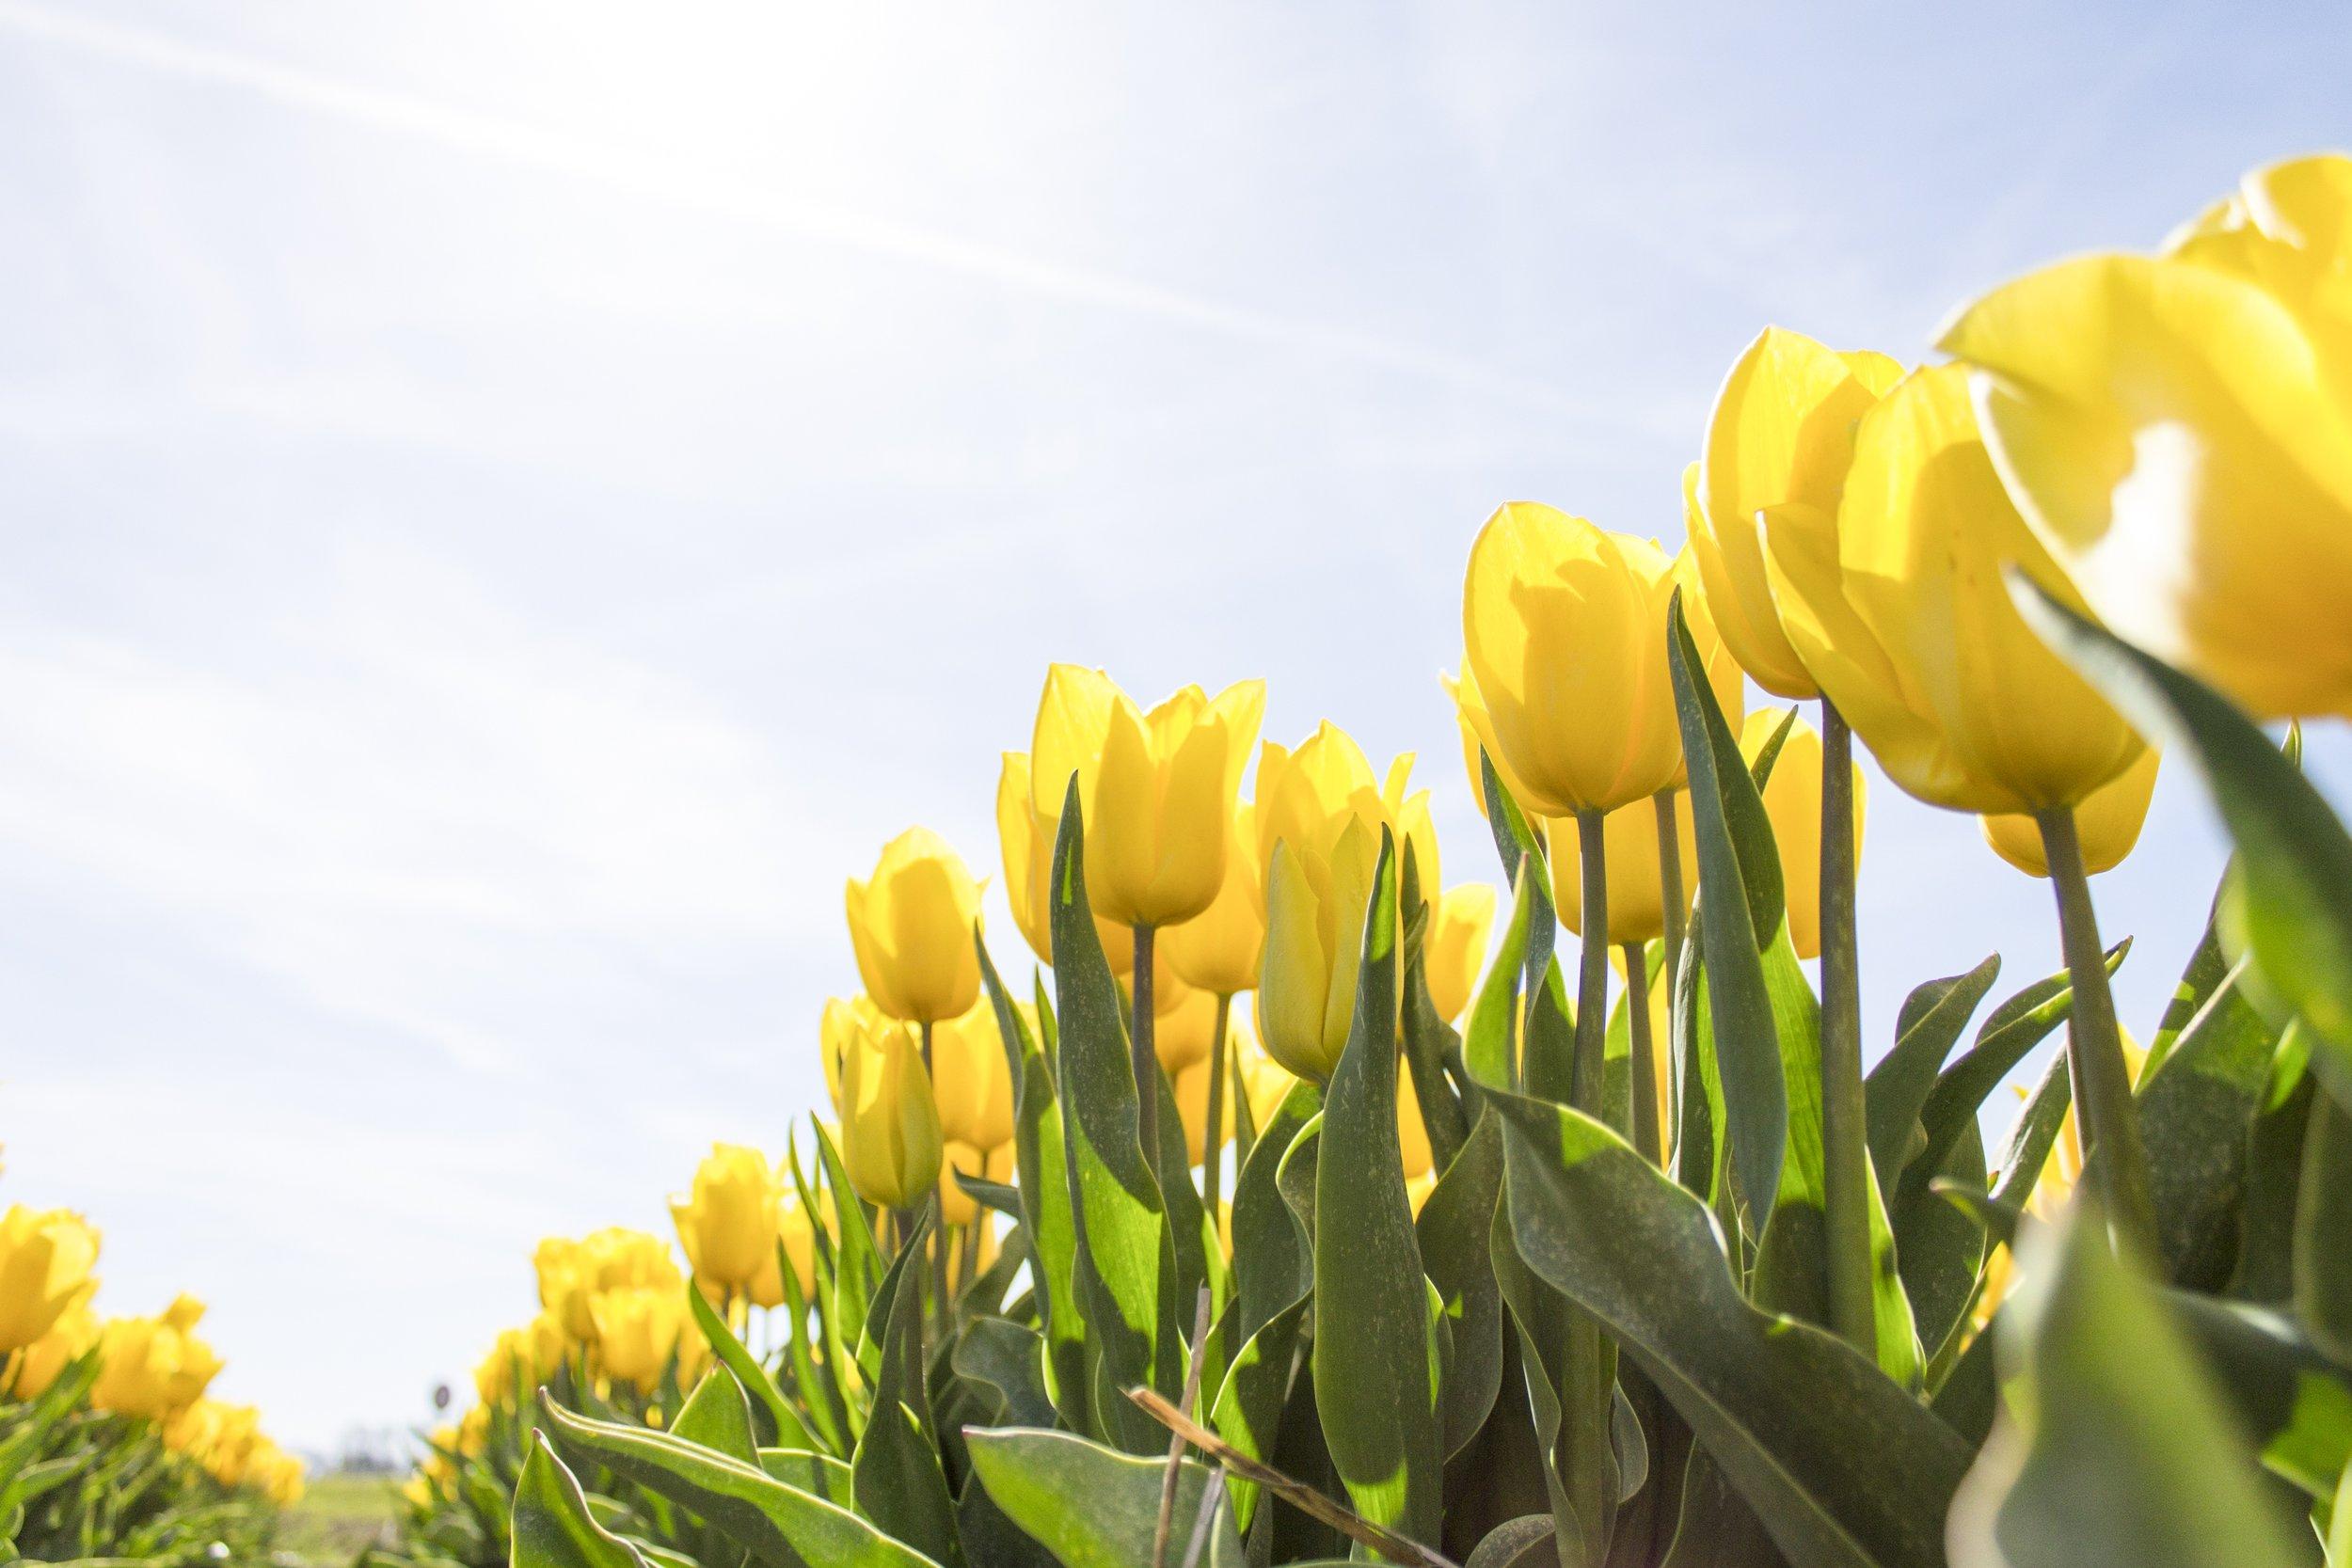 tulips-netherlands-flowers-bloom-159406.jpeg